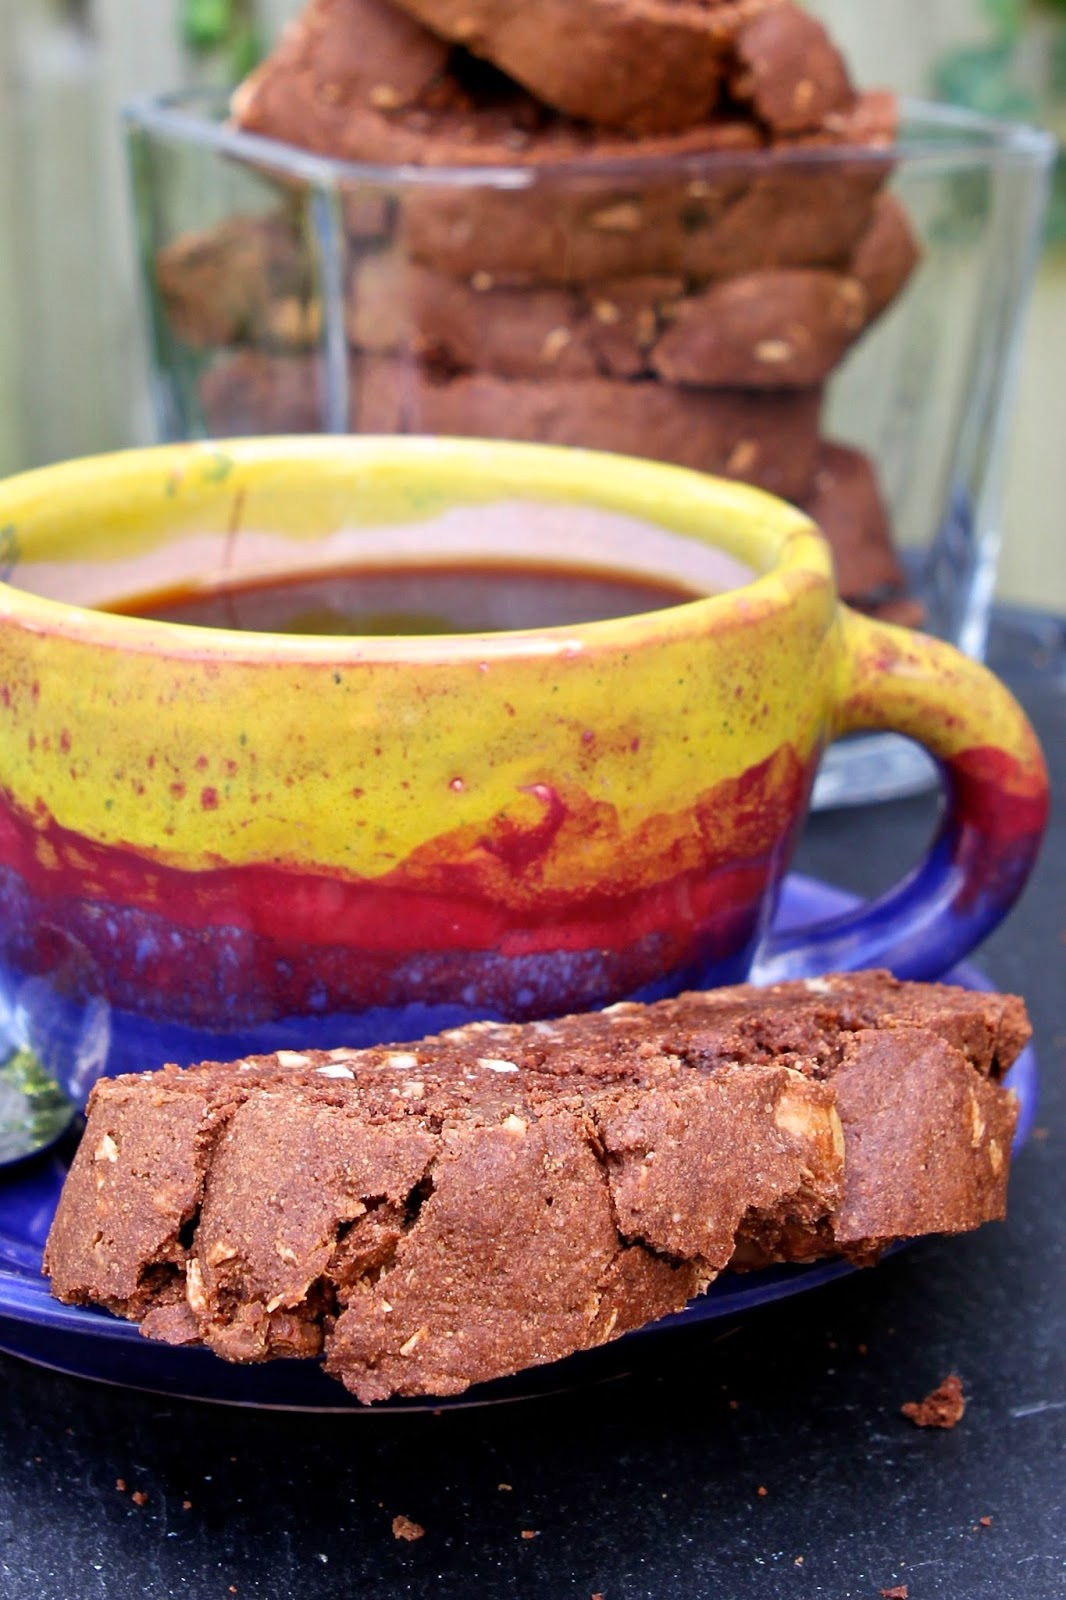 ... : Double Chocolate, Coconut & Macadamia Biscotti (gluten free